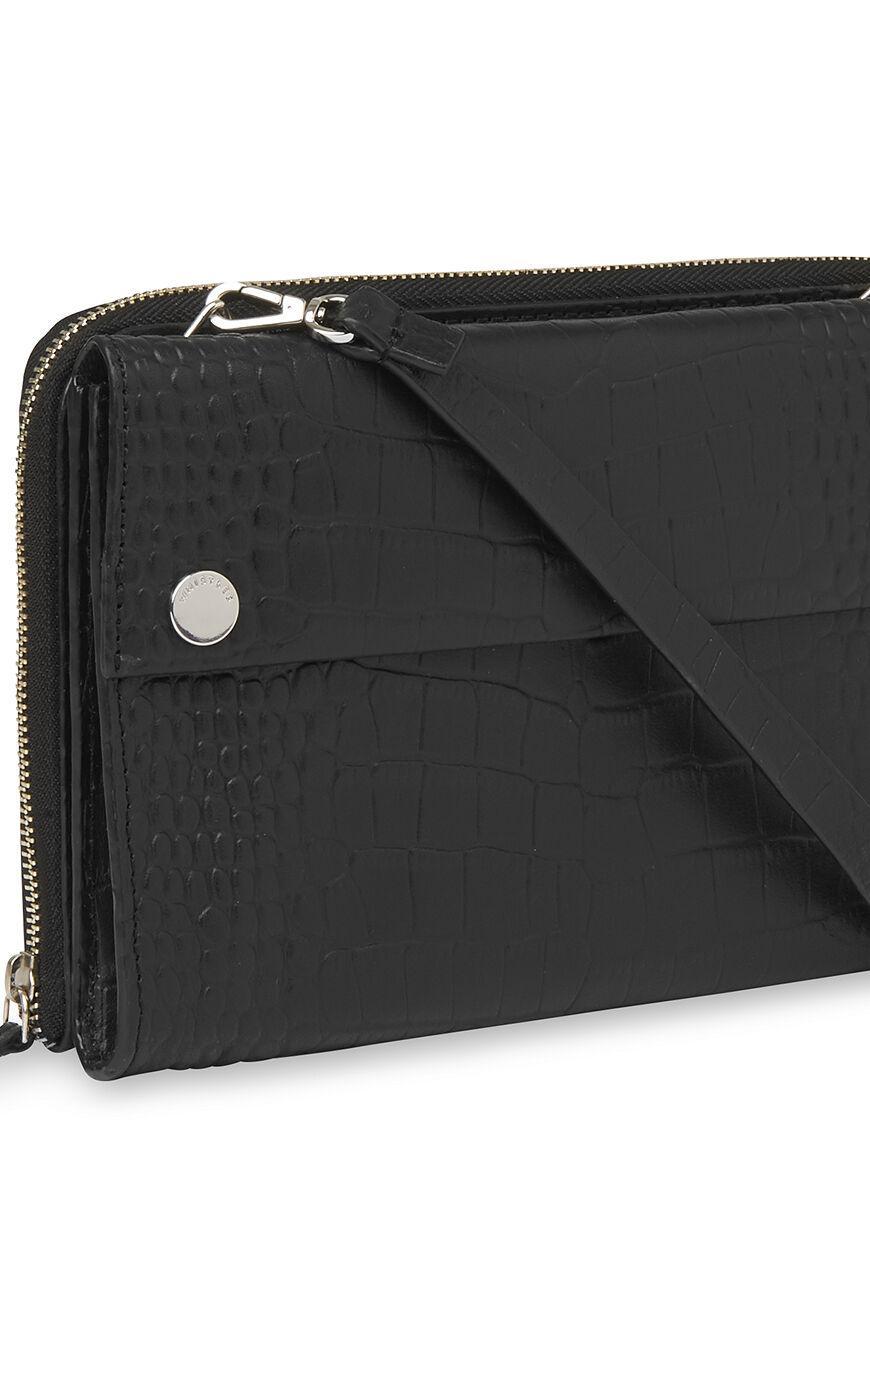 Whistles Leather Aubry Matte Croc Crossbody Bag in Black